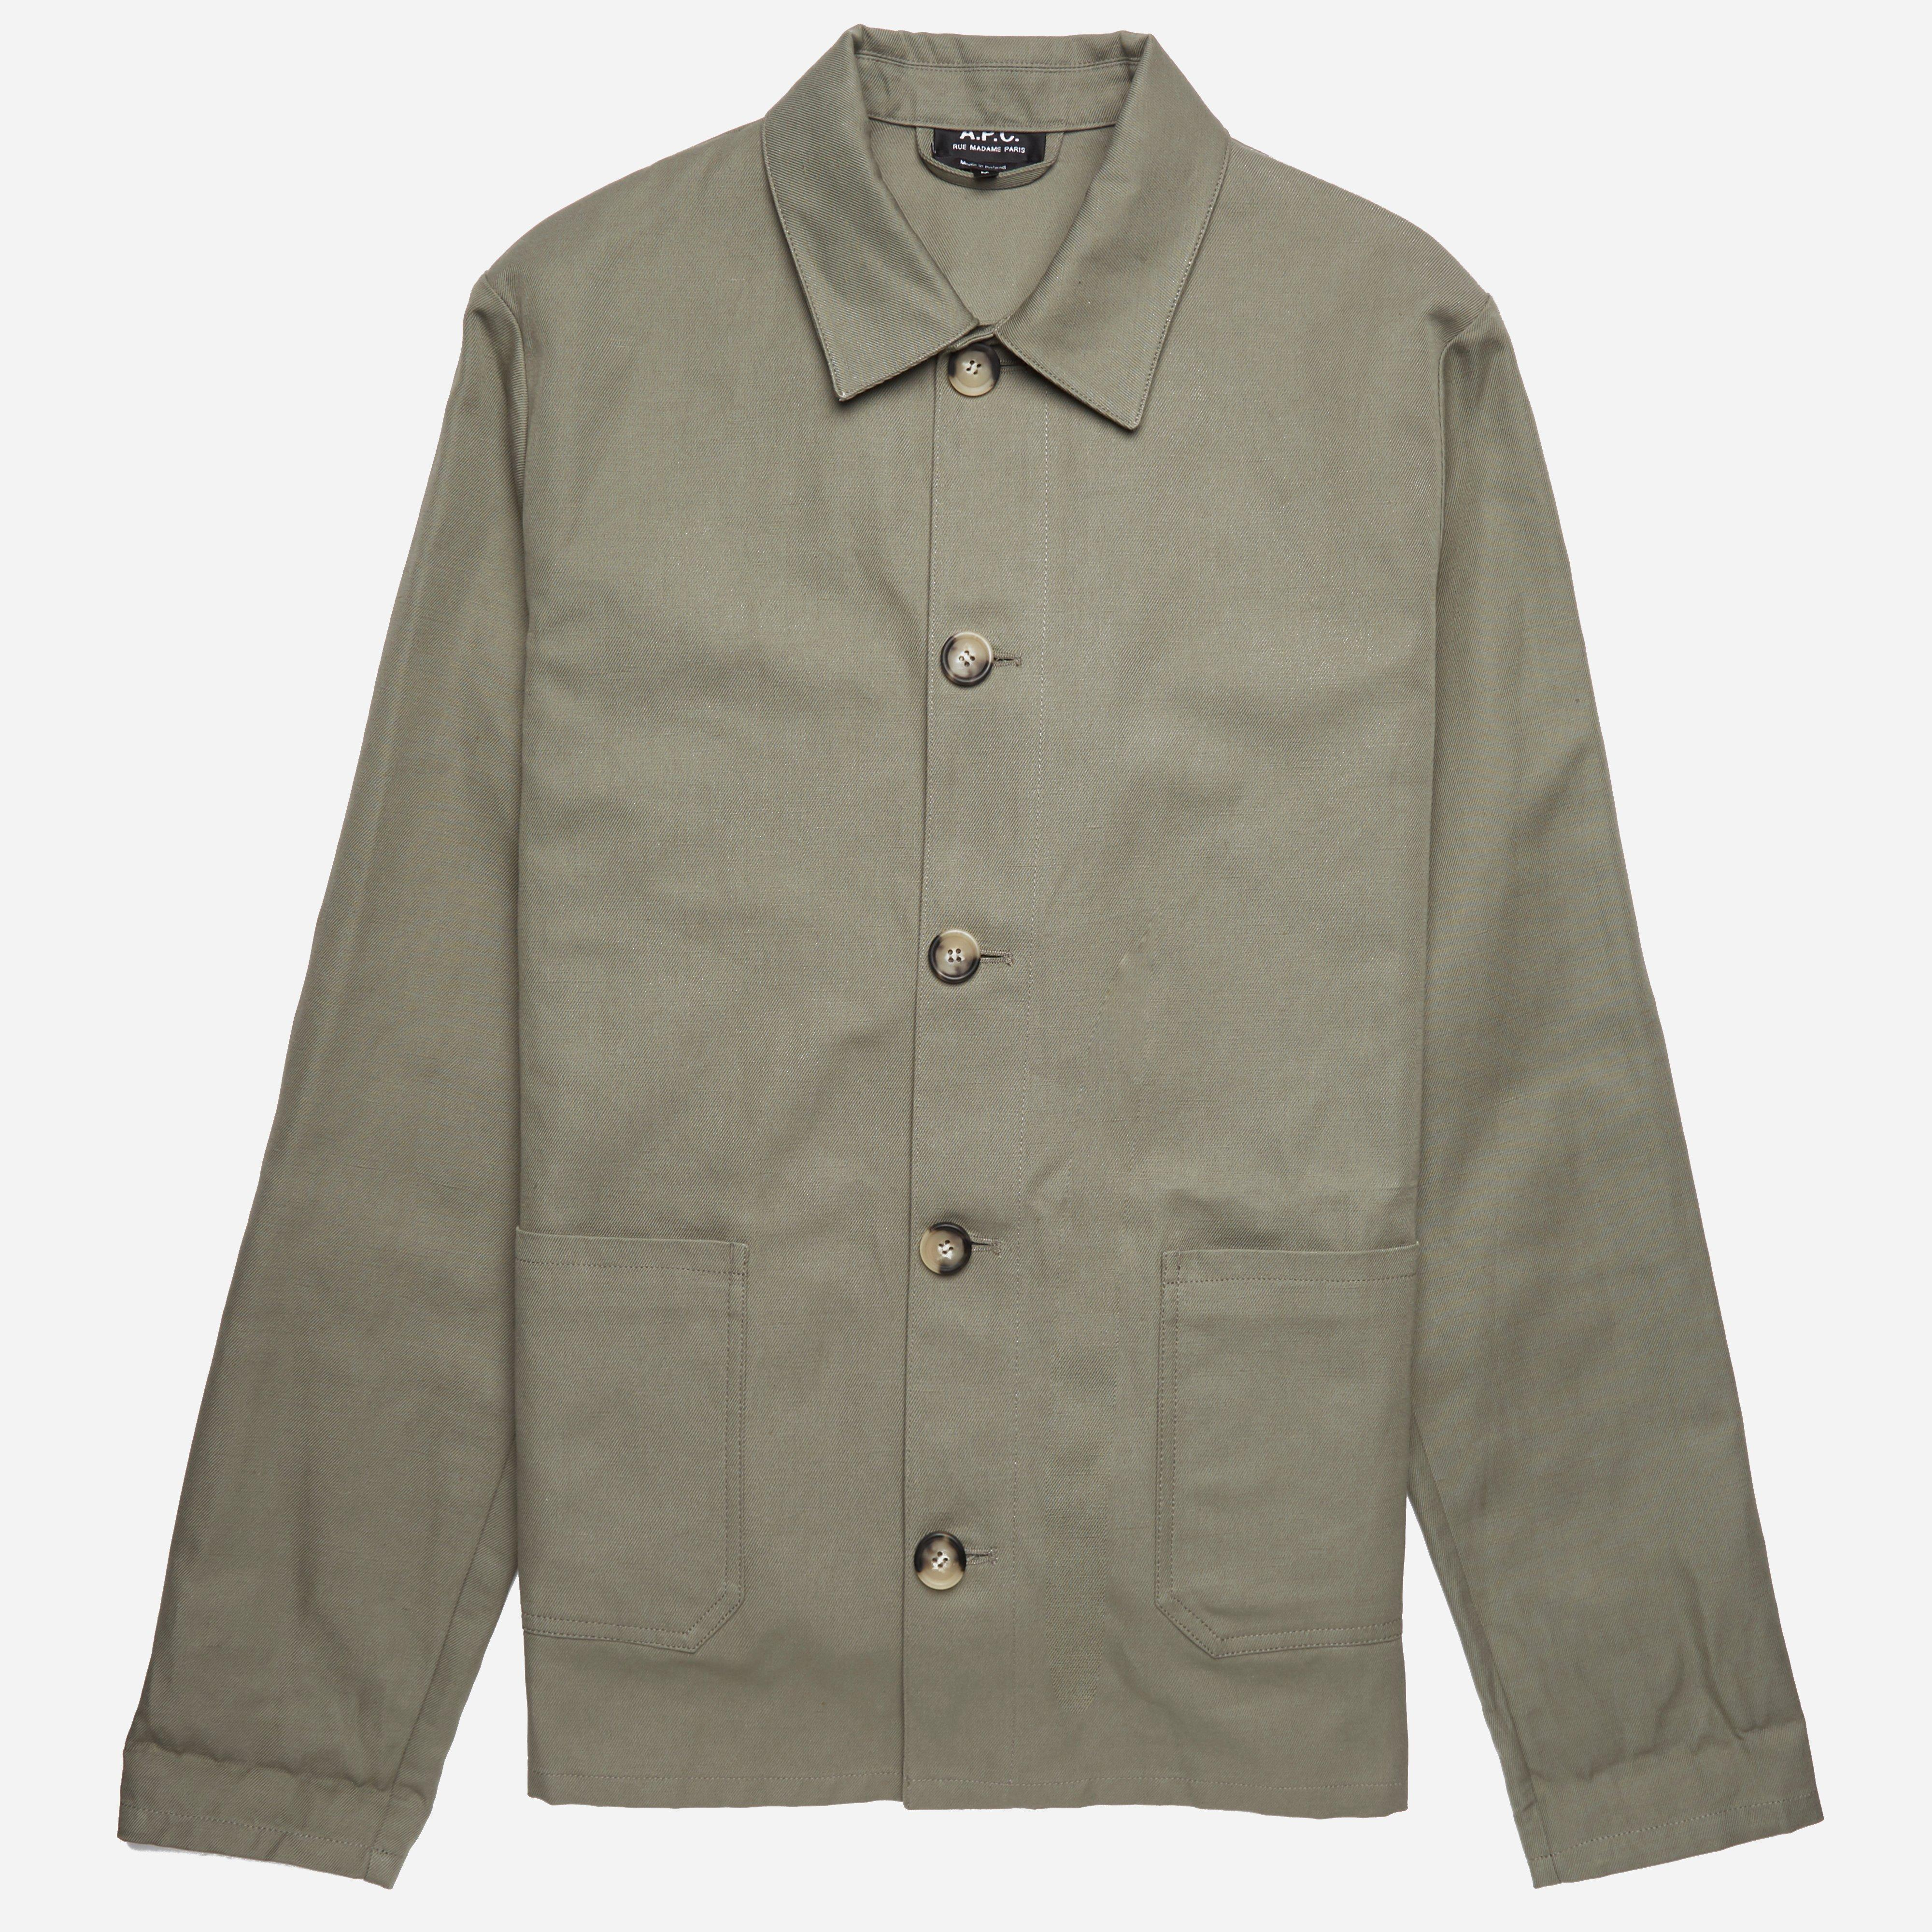 A.P.C Kerlouan Jacket